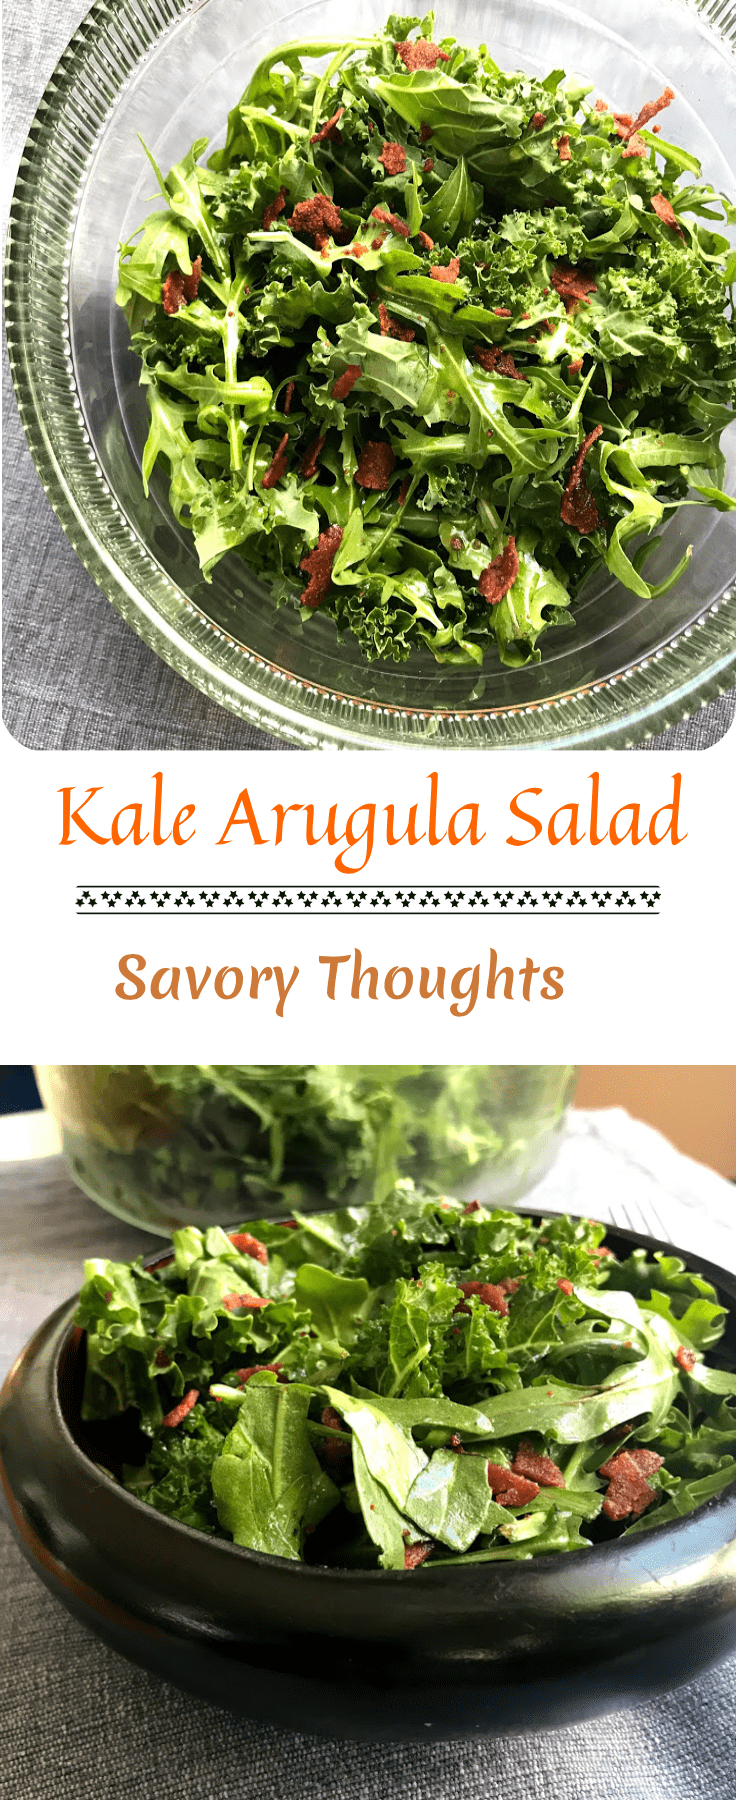 Healthy Kale Arugula Salad (recipe) topped with turkey bacon apple cider vinaigrette. Savory Thoughts. #kale #arugula #salad #kalearugulasalad